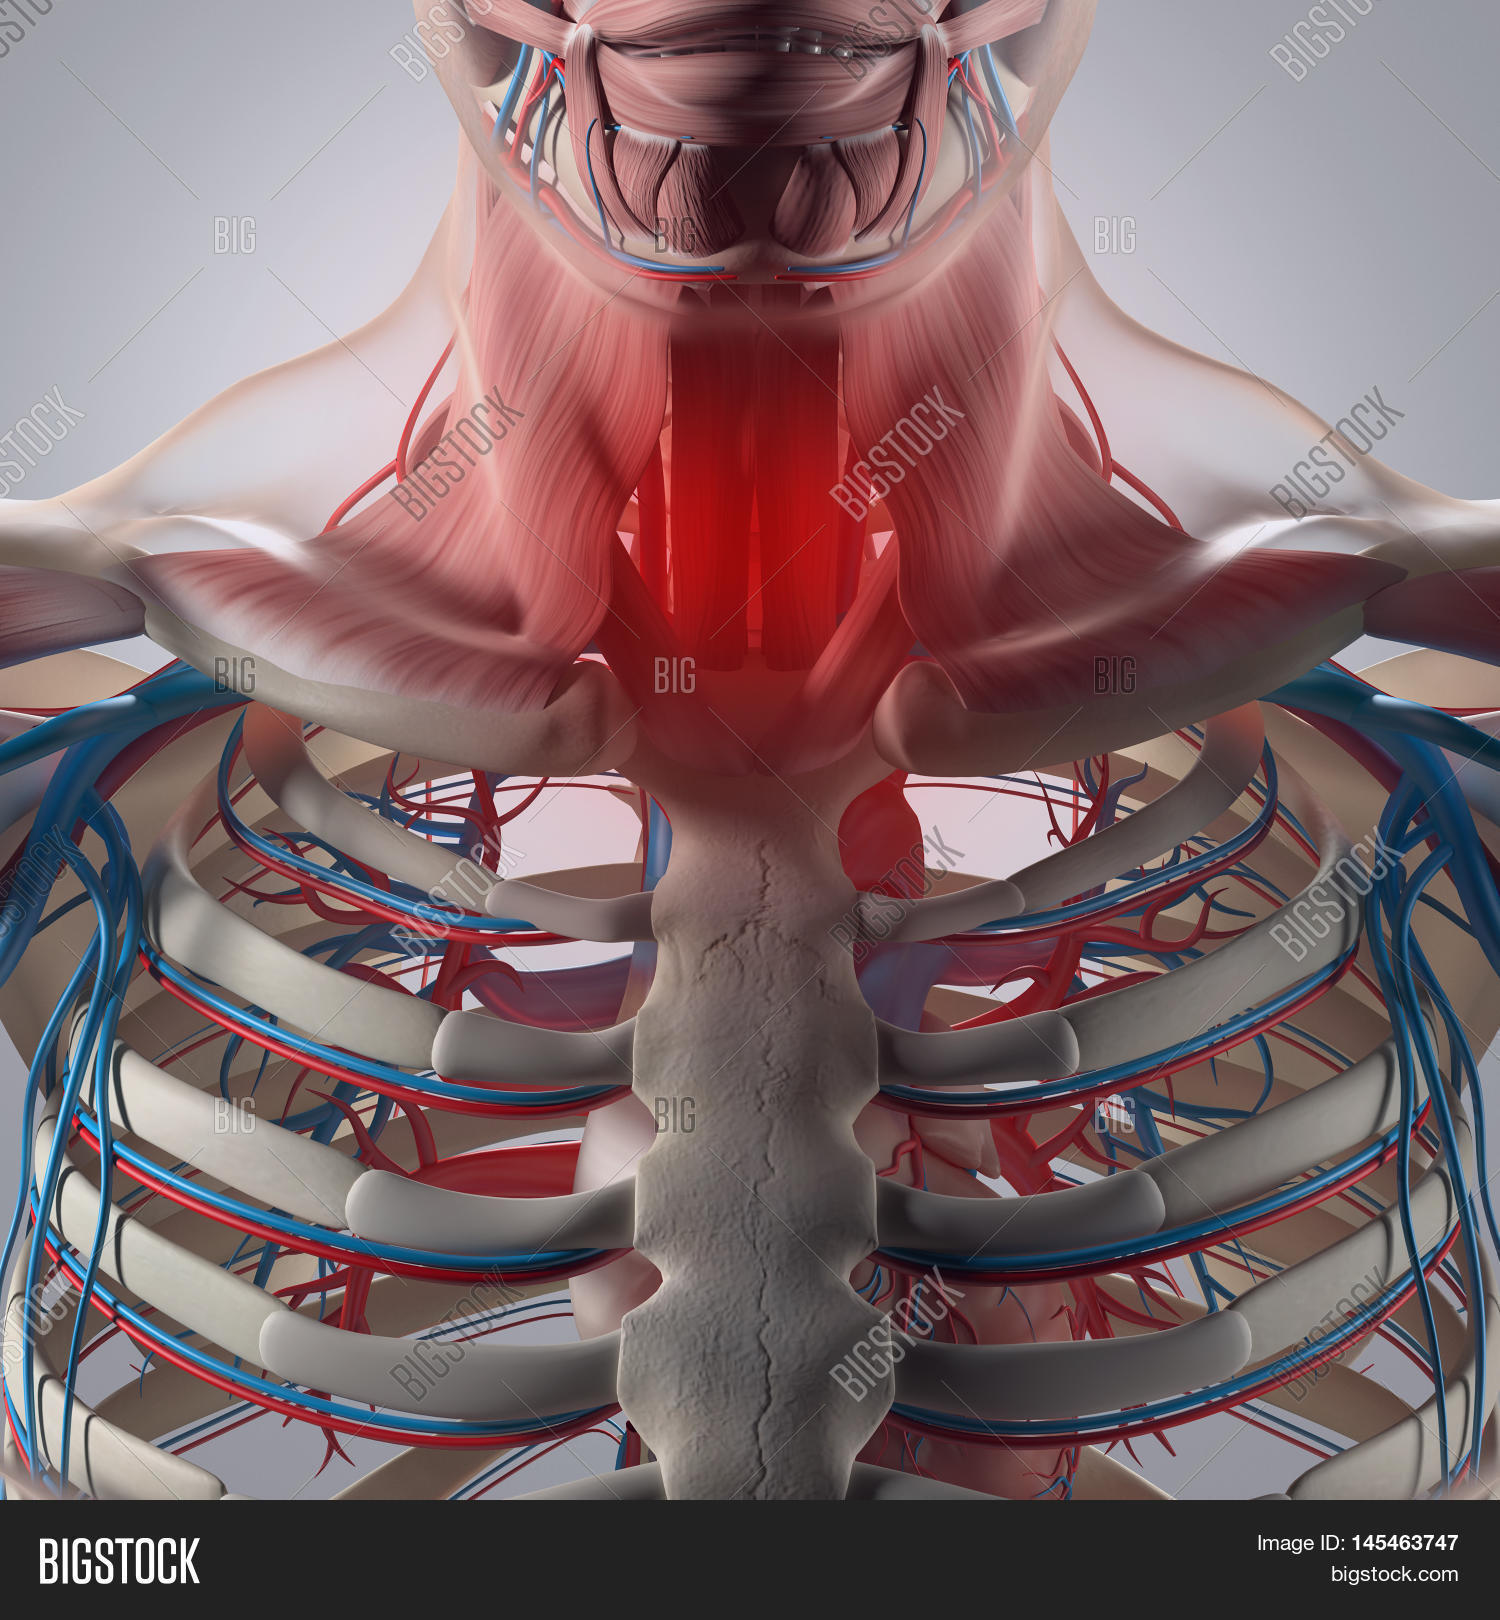 Human Anatomy,sore Image & Photo (Free Trial) | Bigstock